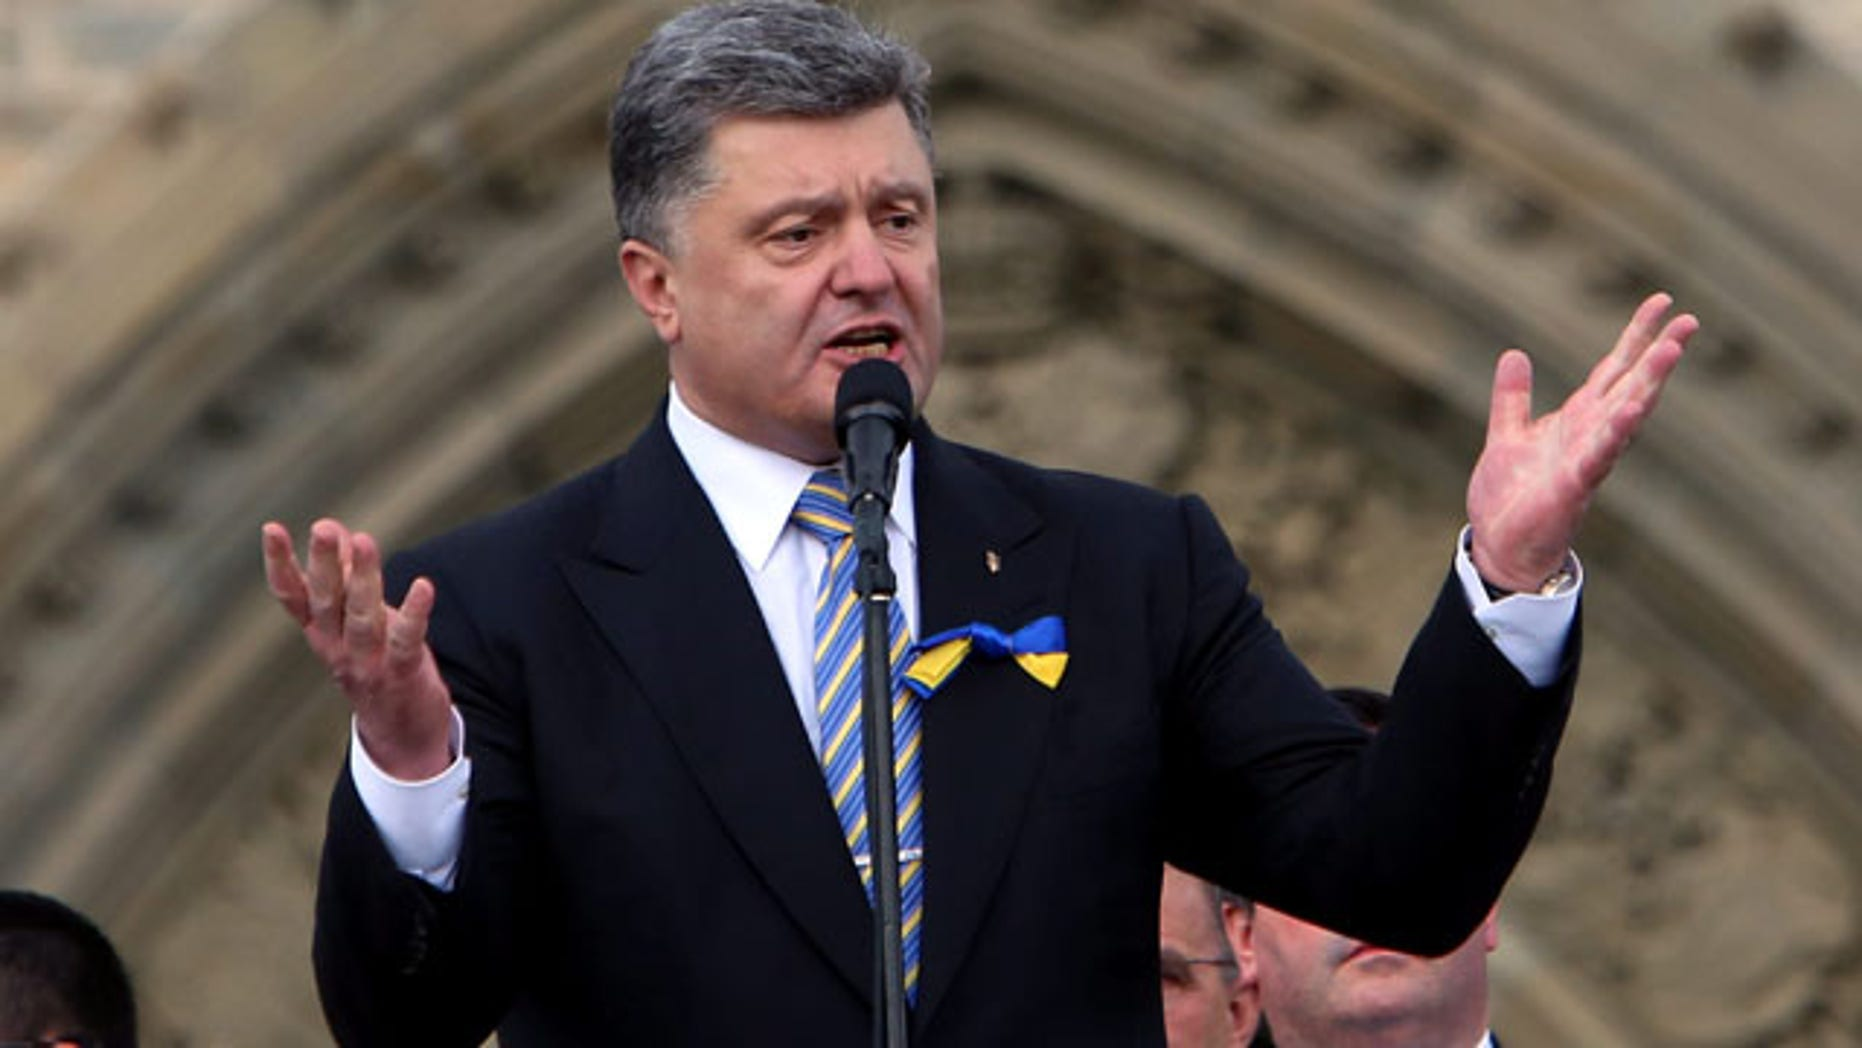 September 17, 2014: Ukrainian President Petro Poroshenko addresses the Canadian-Ukranian community on Parliament Hill, in Ottawa. (AP Photo/The Canadian Press,Fred Chartrand)